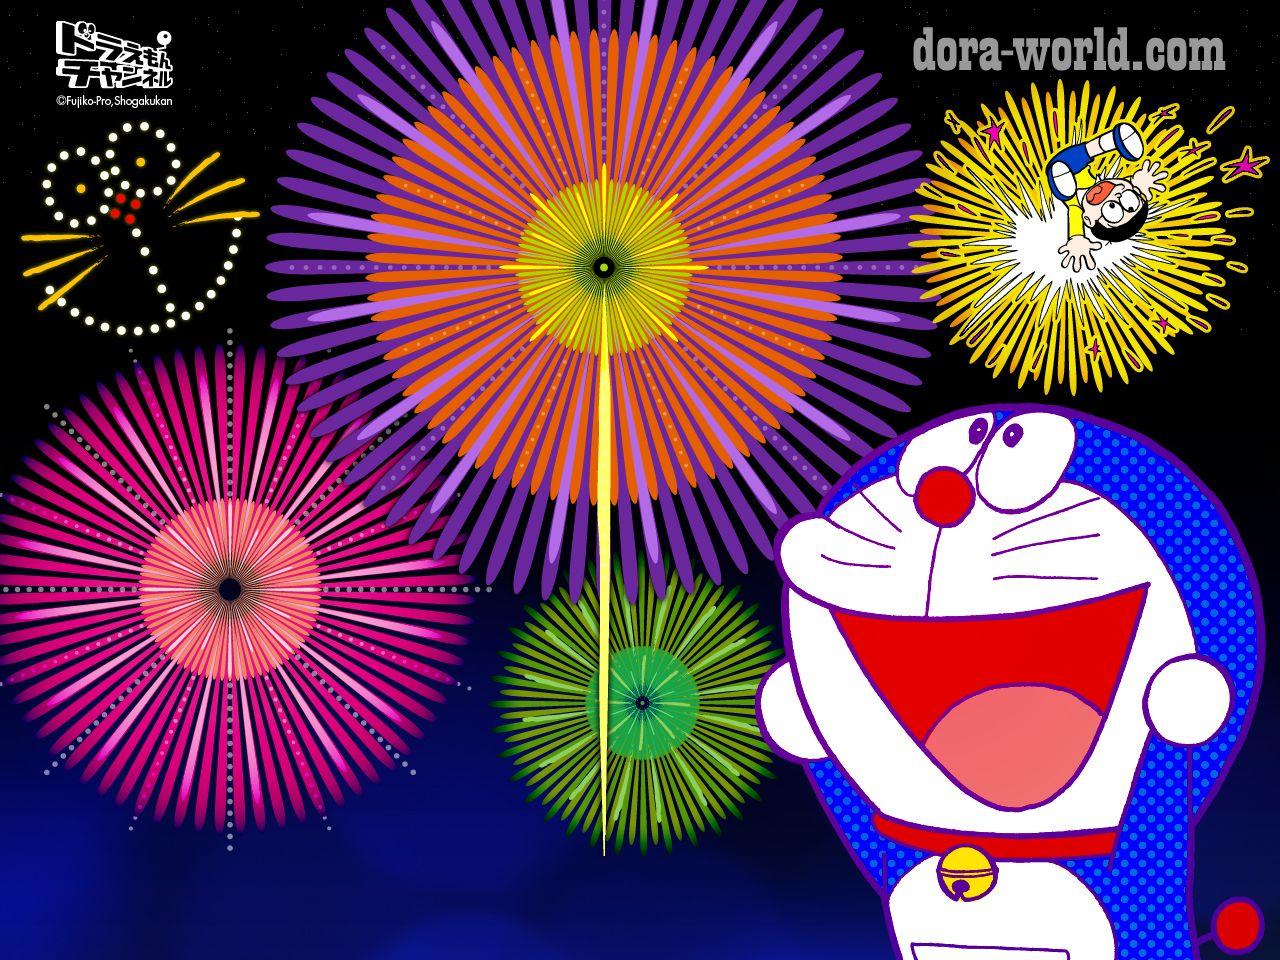 Gambar Doraemon Kartun Pinterest